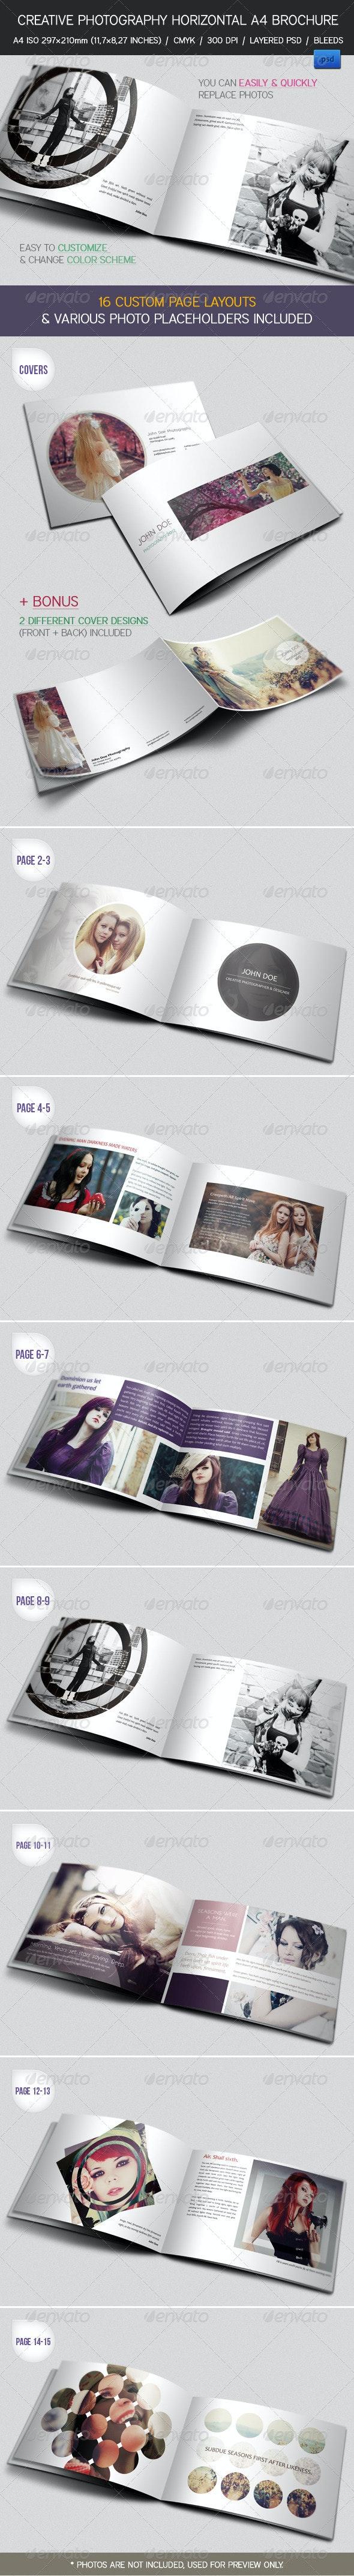 Creative Photography Portfolio A4 Brochure - Portfolio Brochures